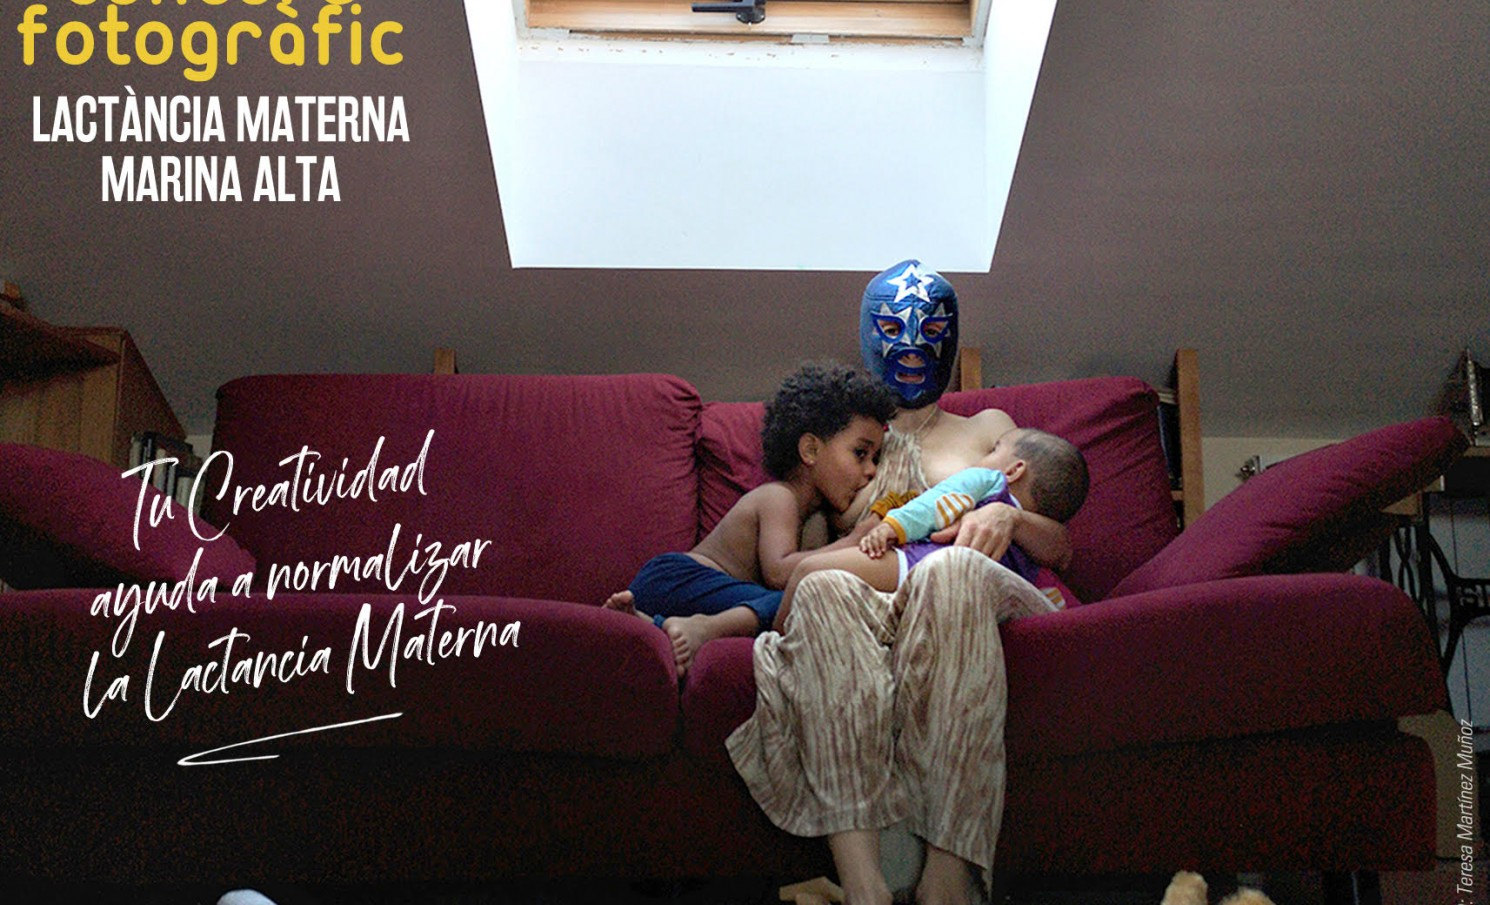 XXV Concurso fotográfico Lactancia Materna Marina Alta 2021